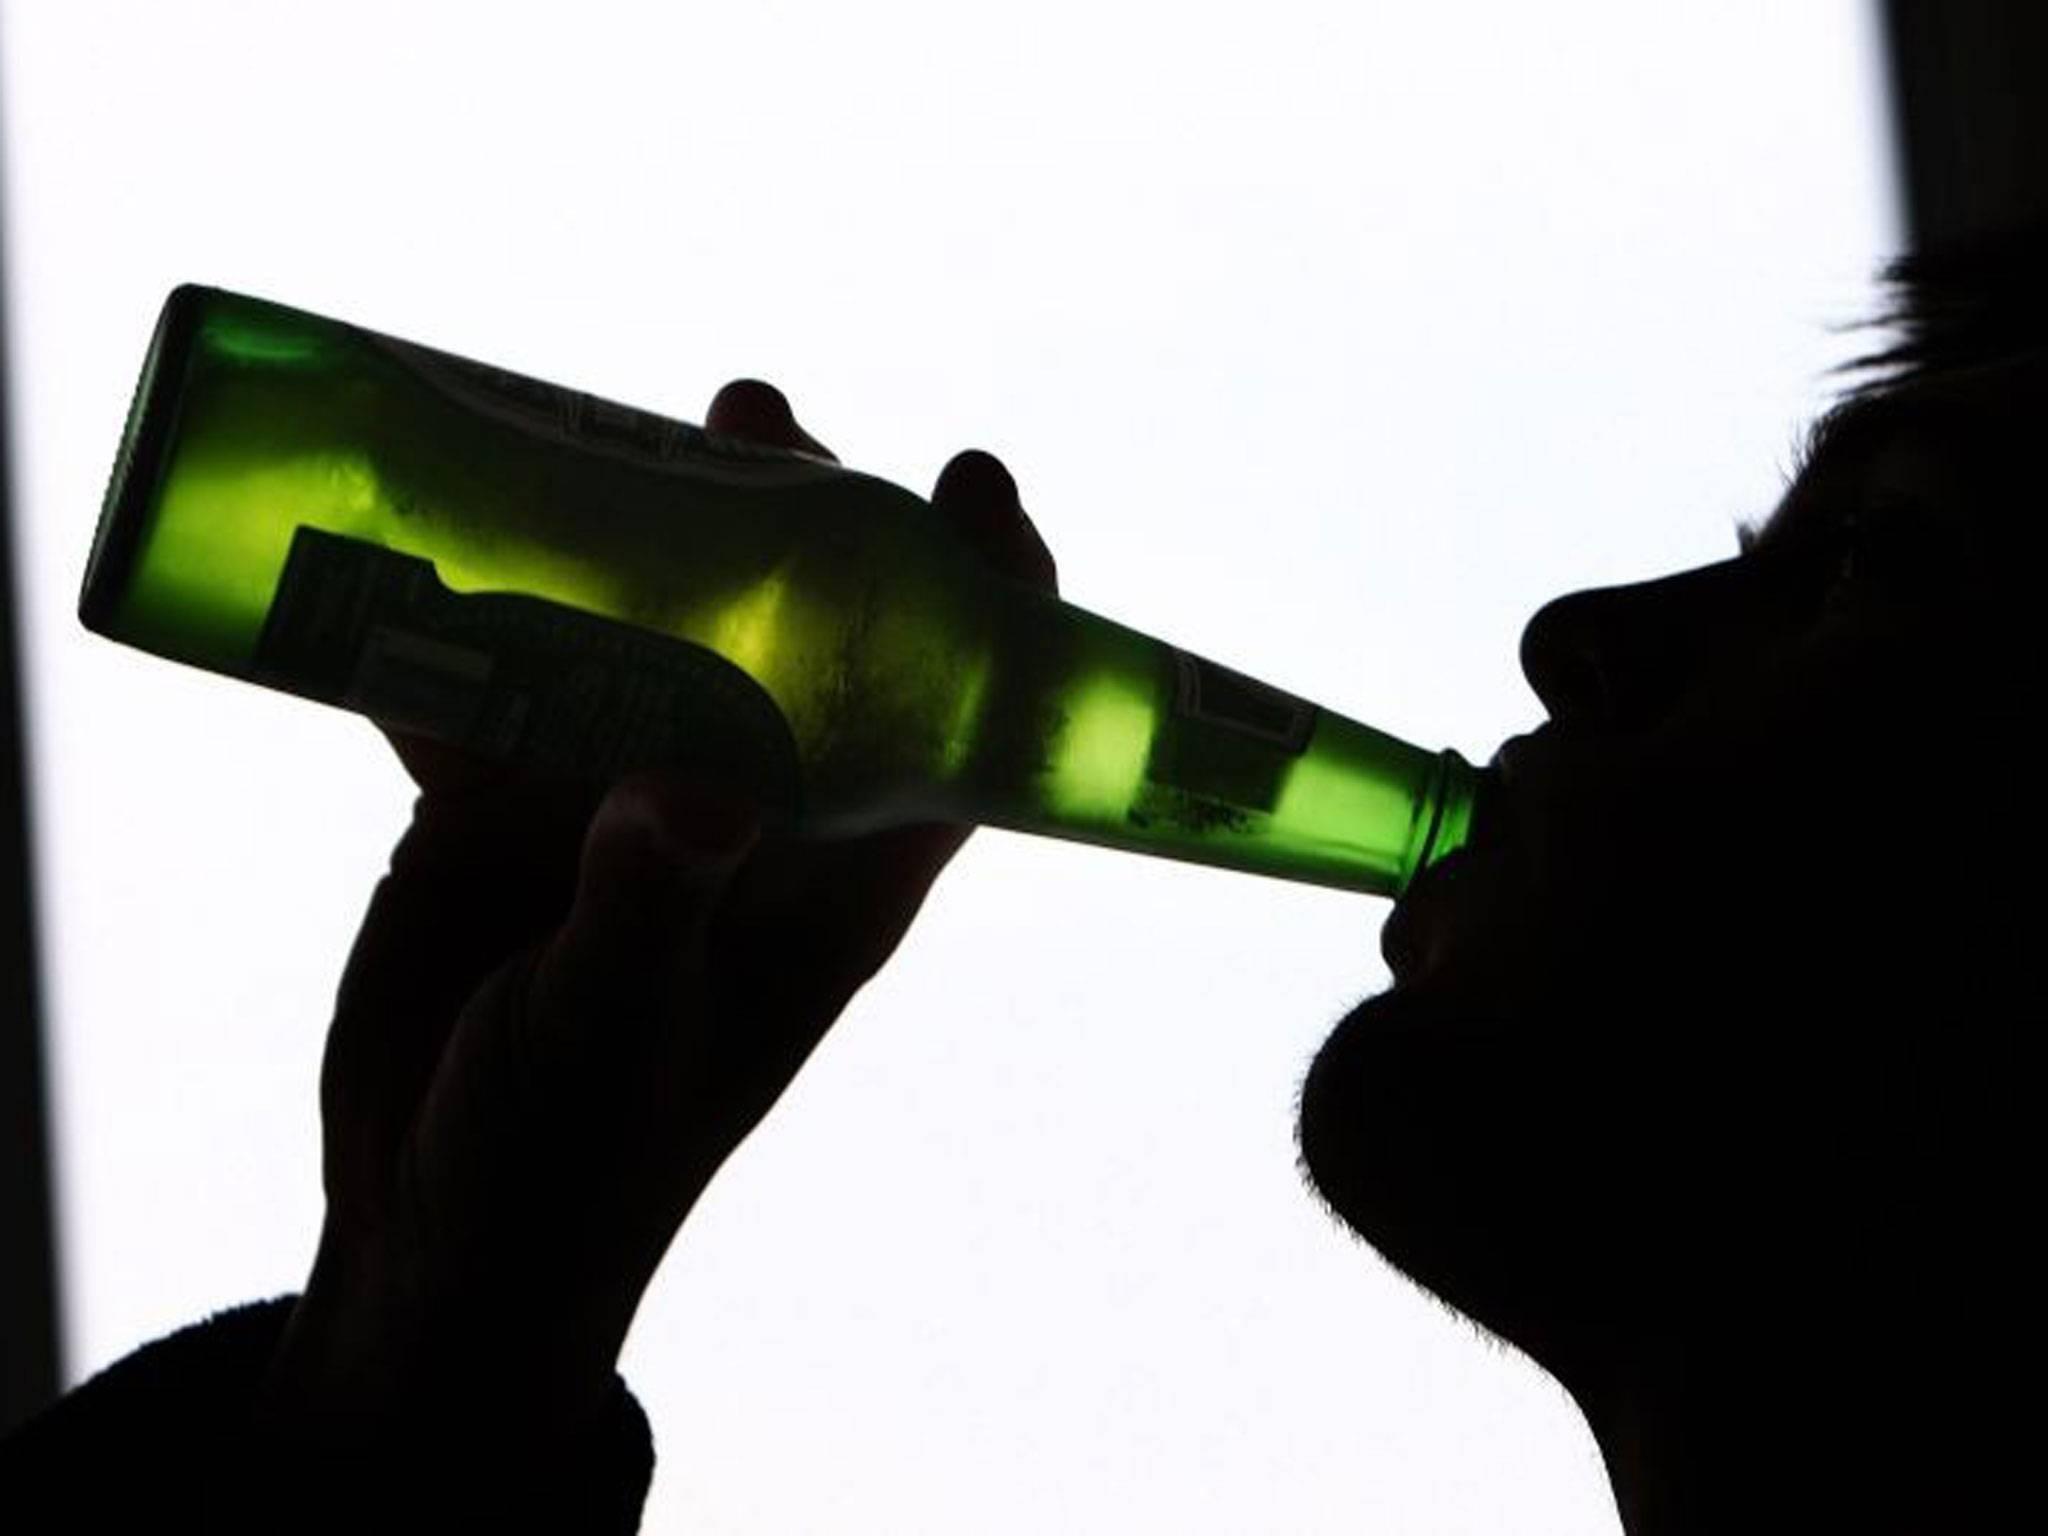 Românilor le place mult băutura (Wikimedia Commons)